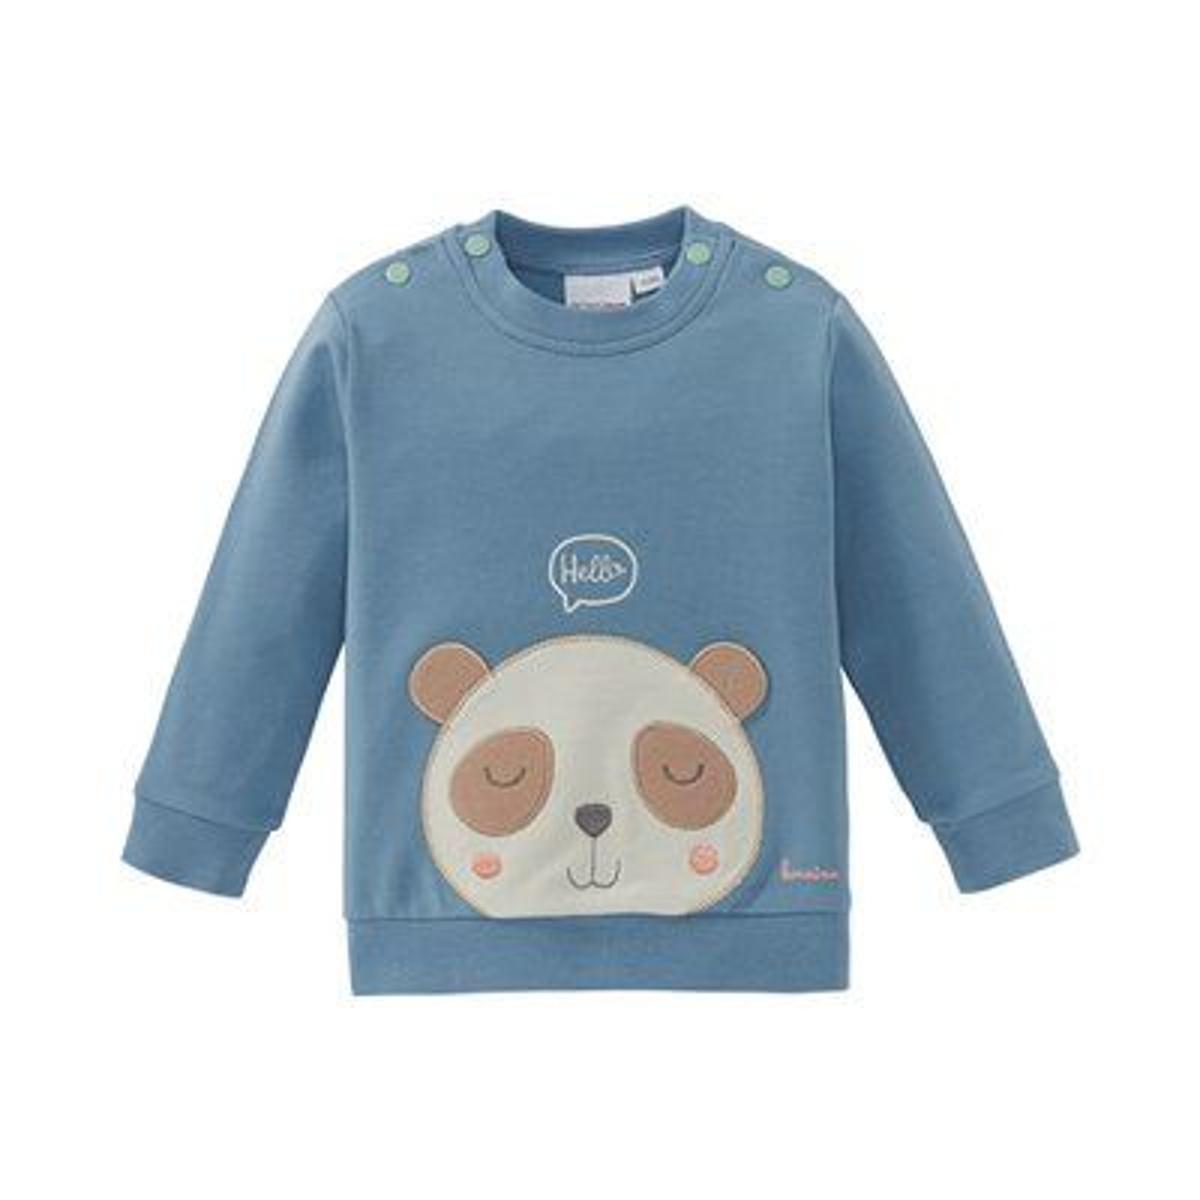 Bornino Sweat-shirt Panda T-shirt bébé vêtements bébé